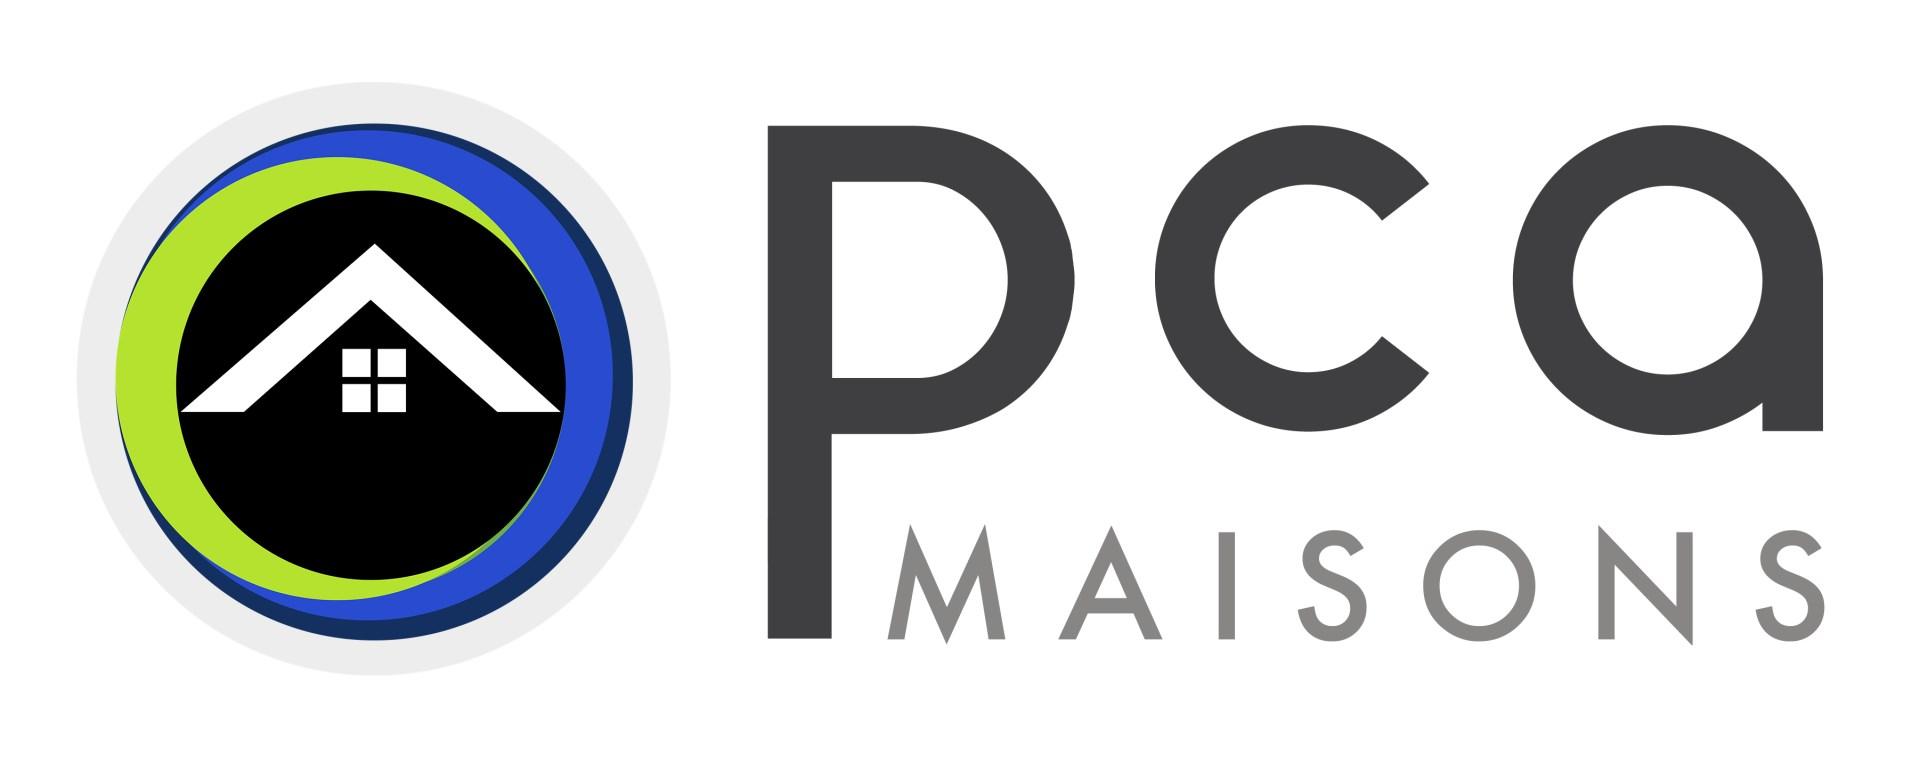 PCA MAISONS - OLLIOULES